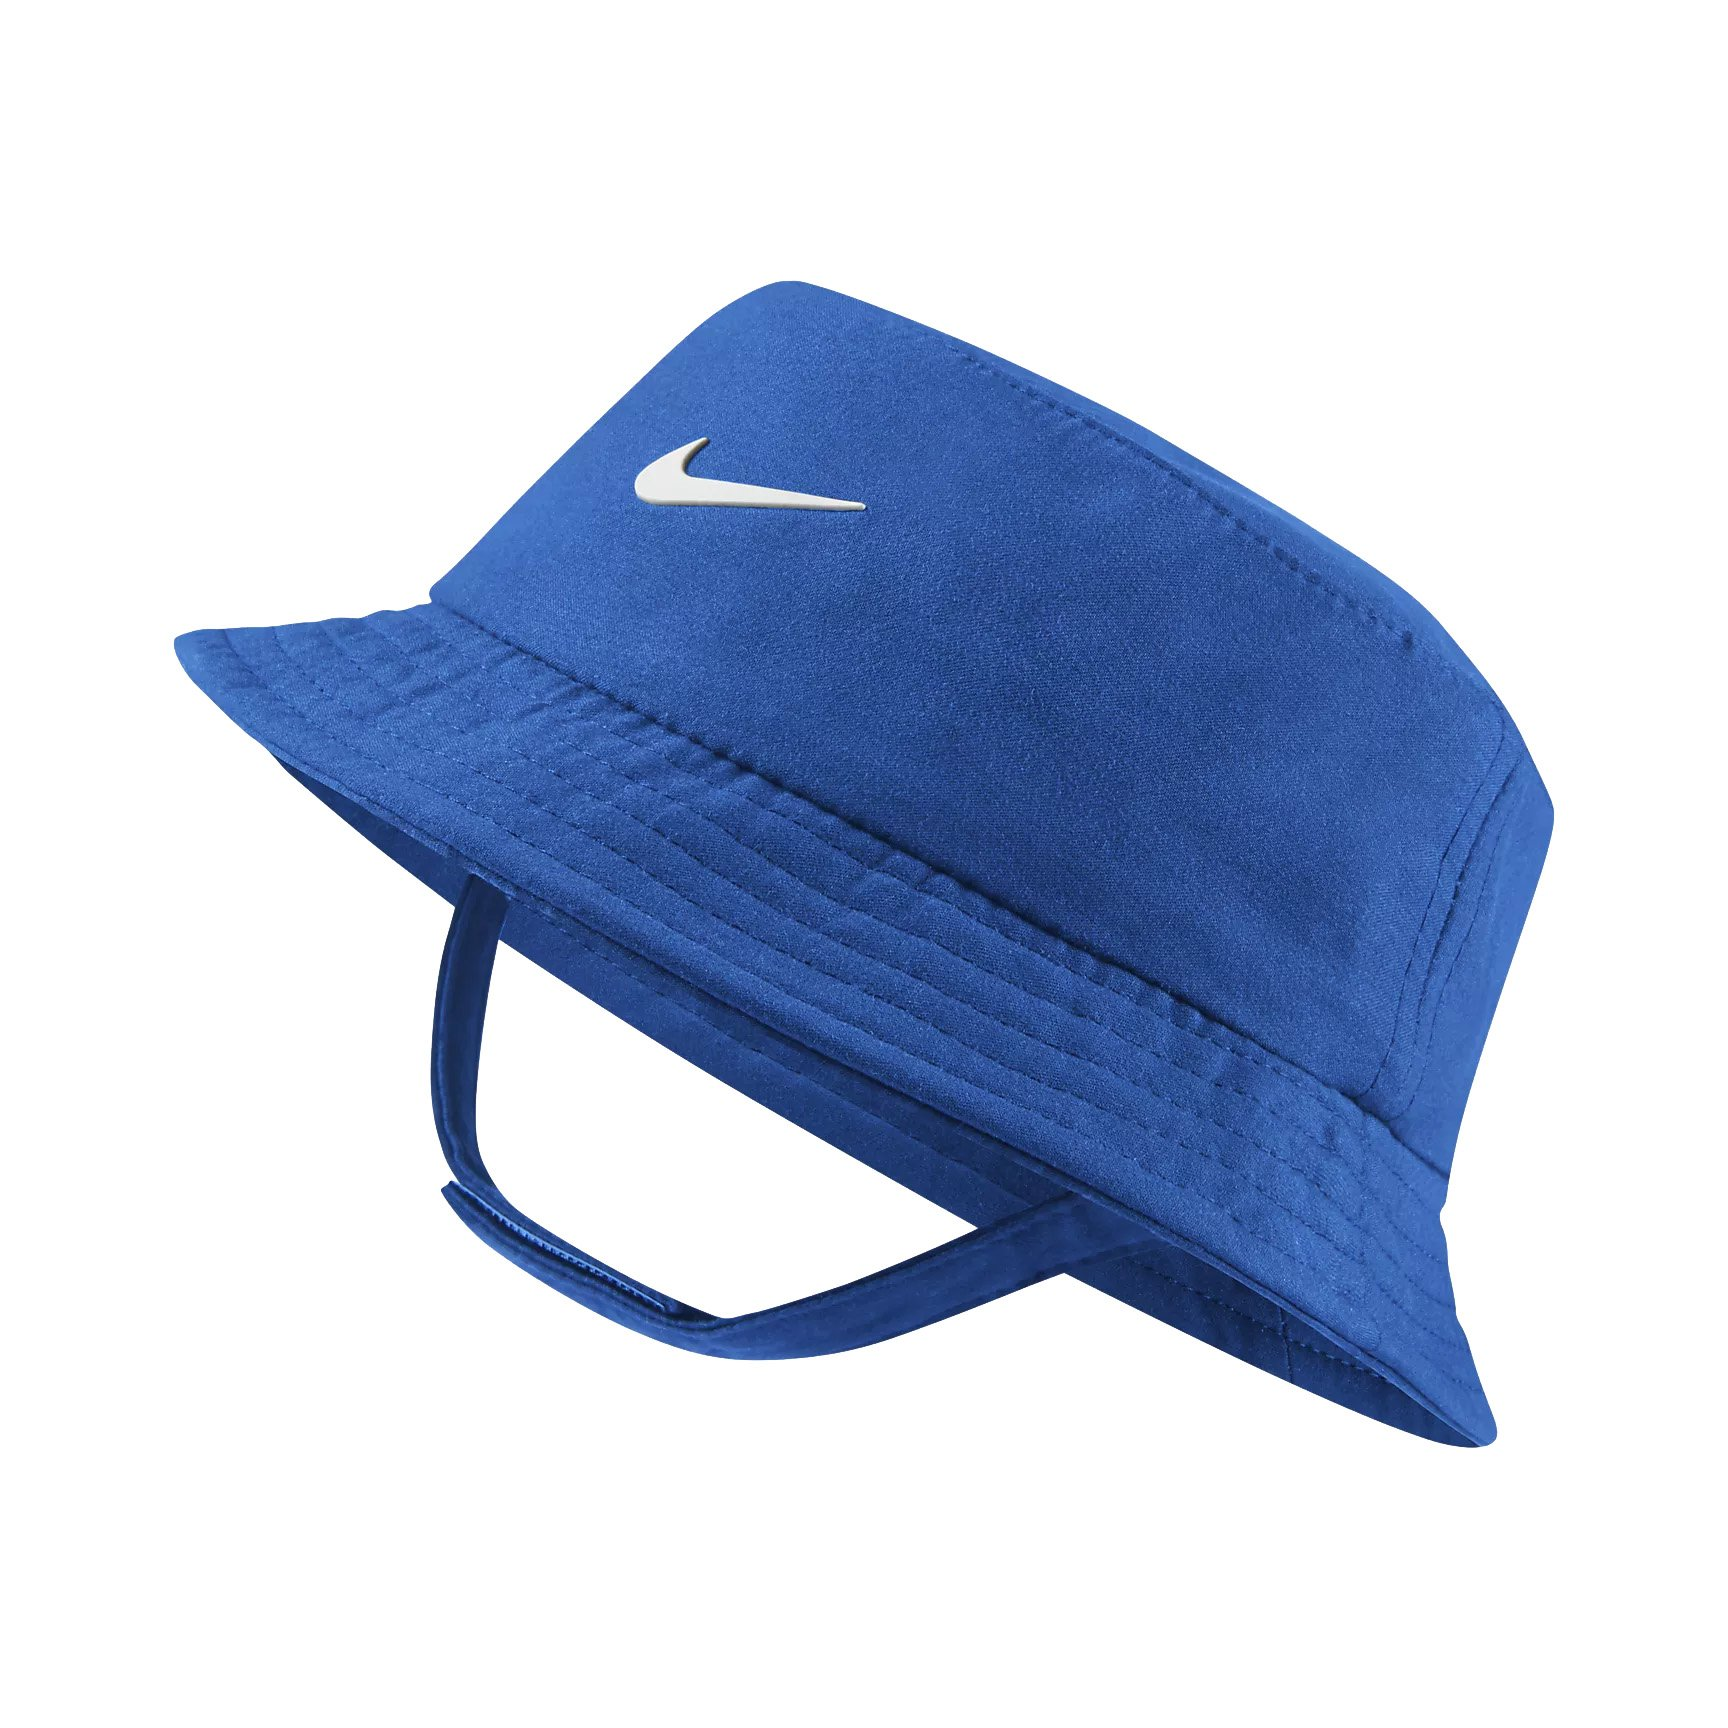 NIKE Dry Infant/Toddler Girls' Bucket Hat (Game Royal (7A2682-U89)/White, 12-24 Months)